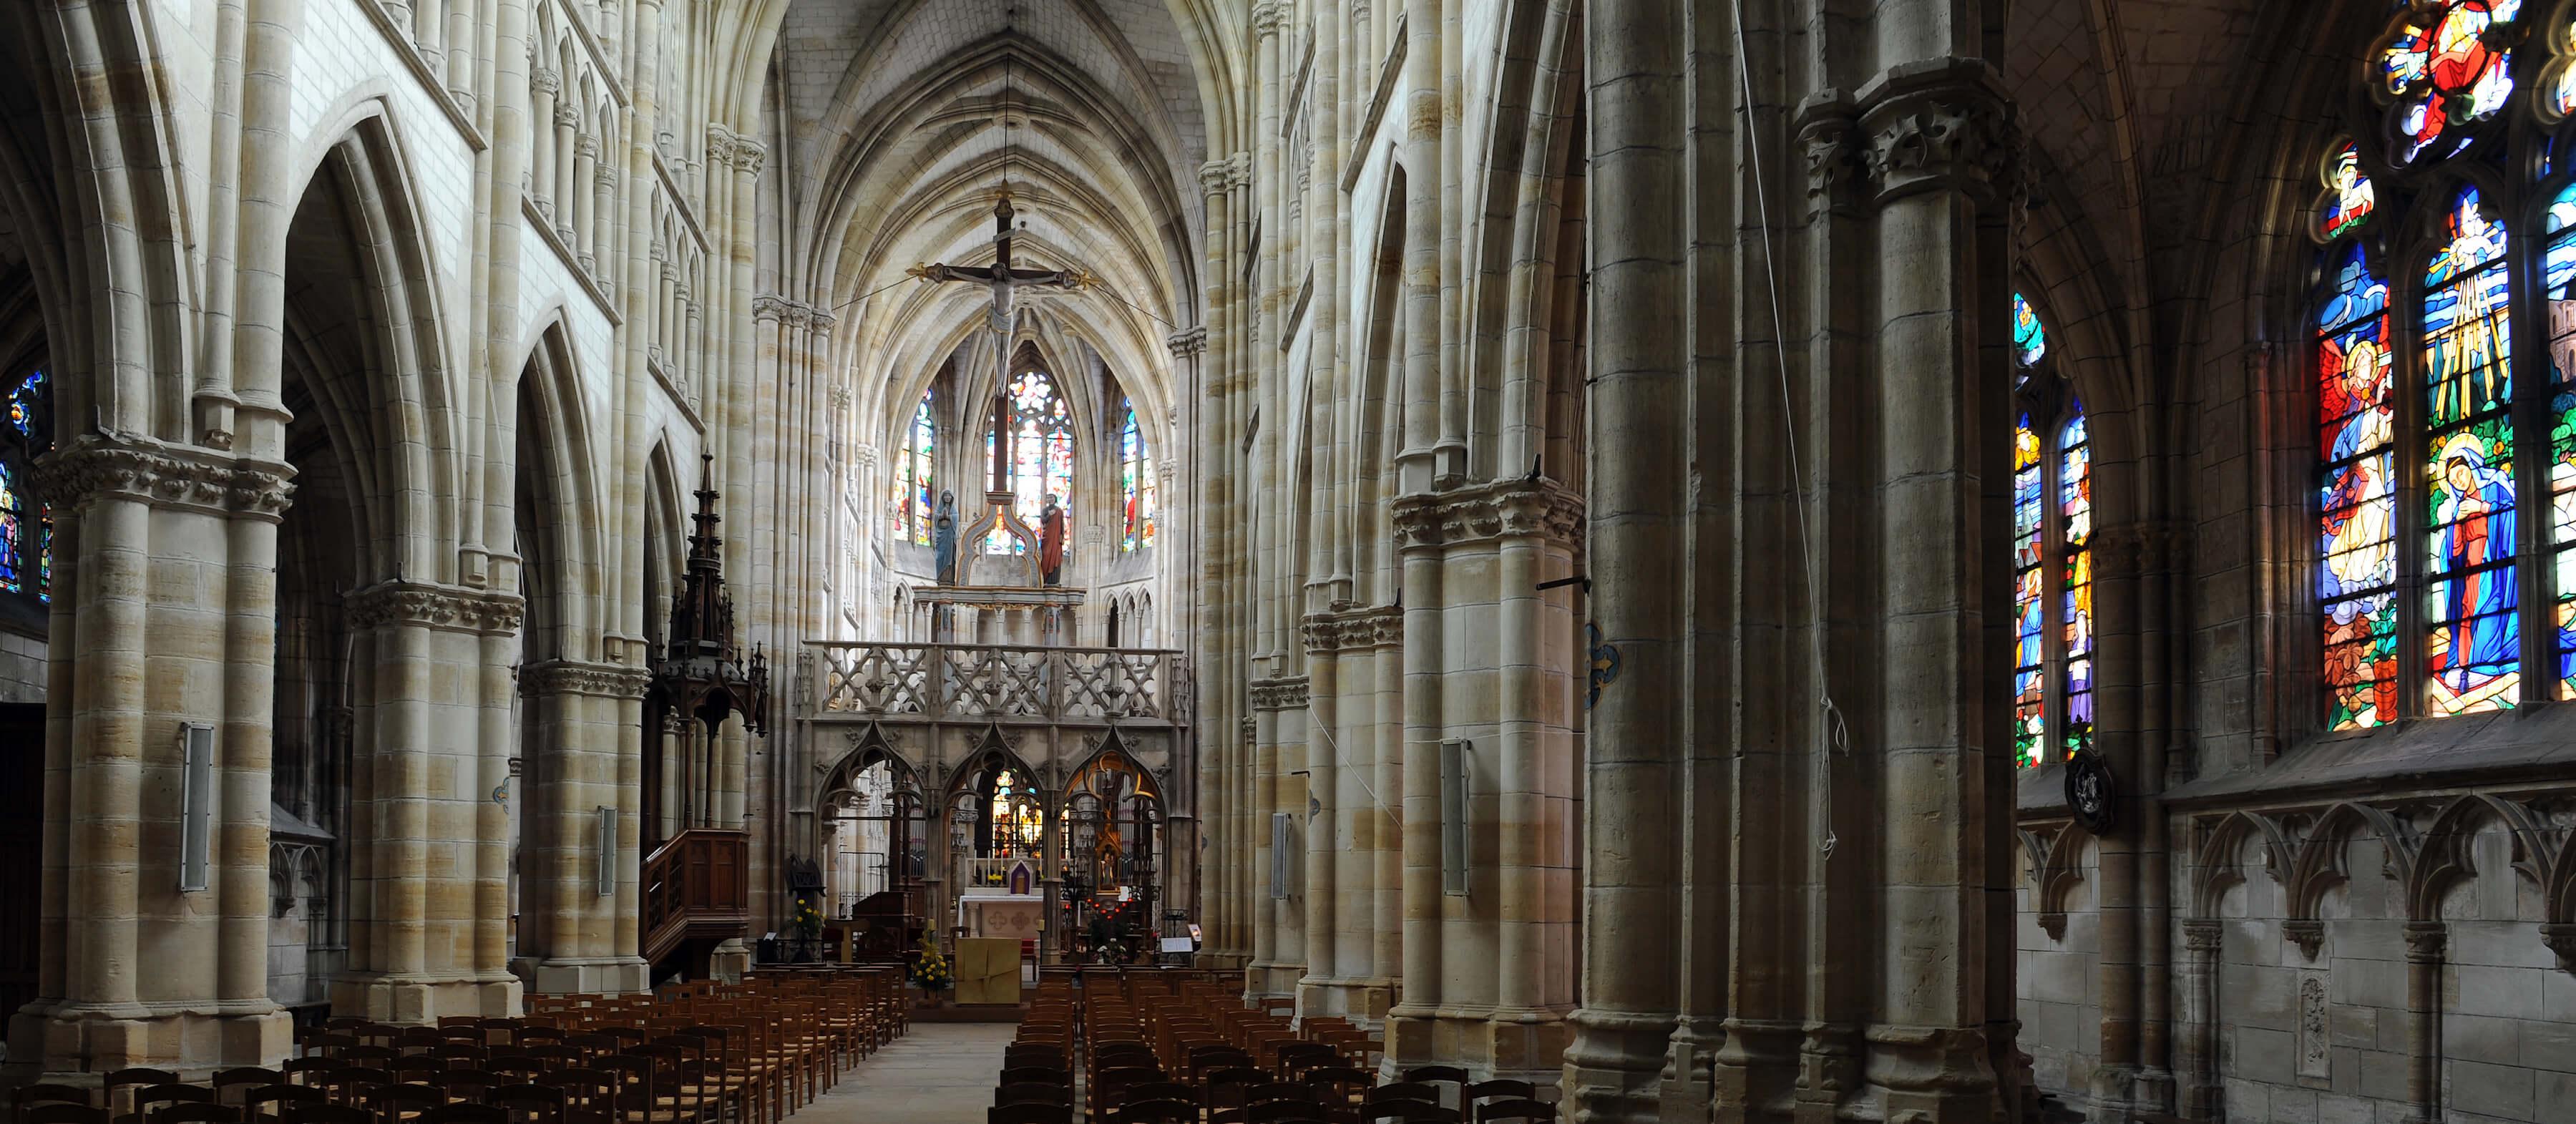 Basilique Notre-Dame©ACIR / JJ Gelbart